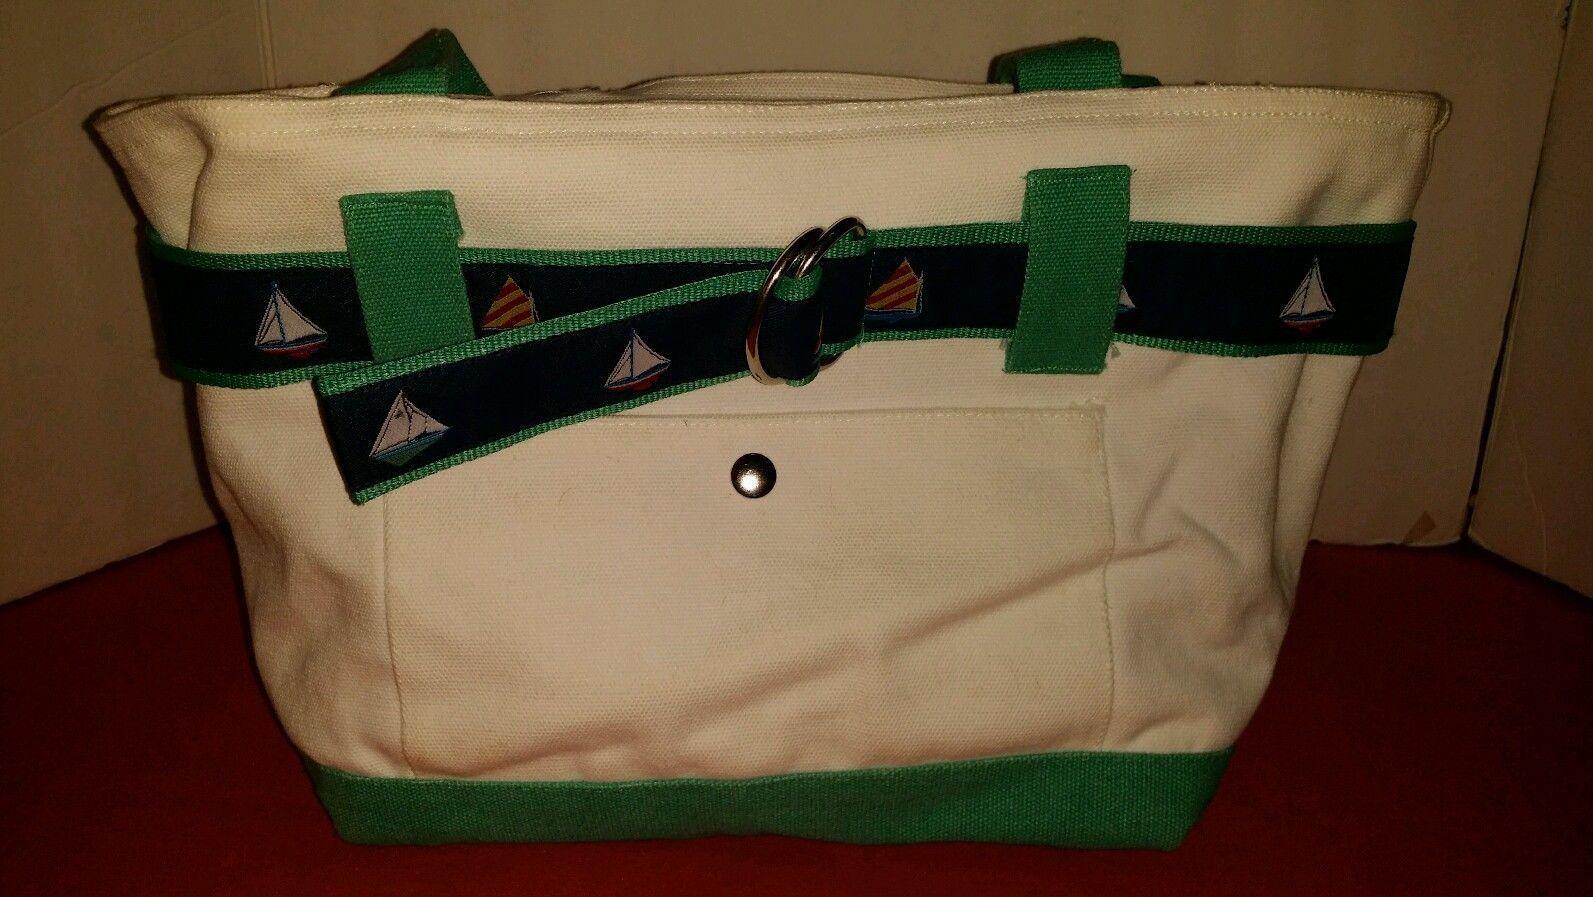 Medium White Canvas Tote Roomy Purse-Sailboat Detailing-Summer! - Handbags & Purses Priced at $11.69